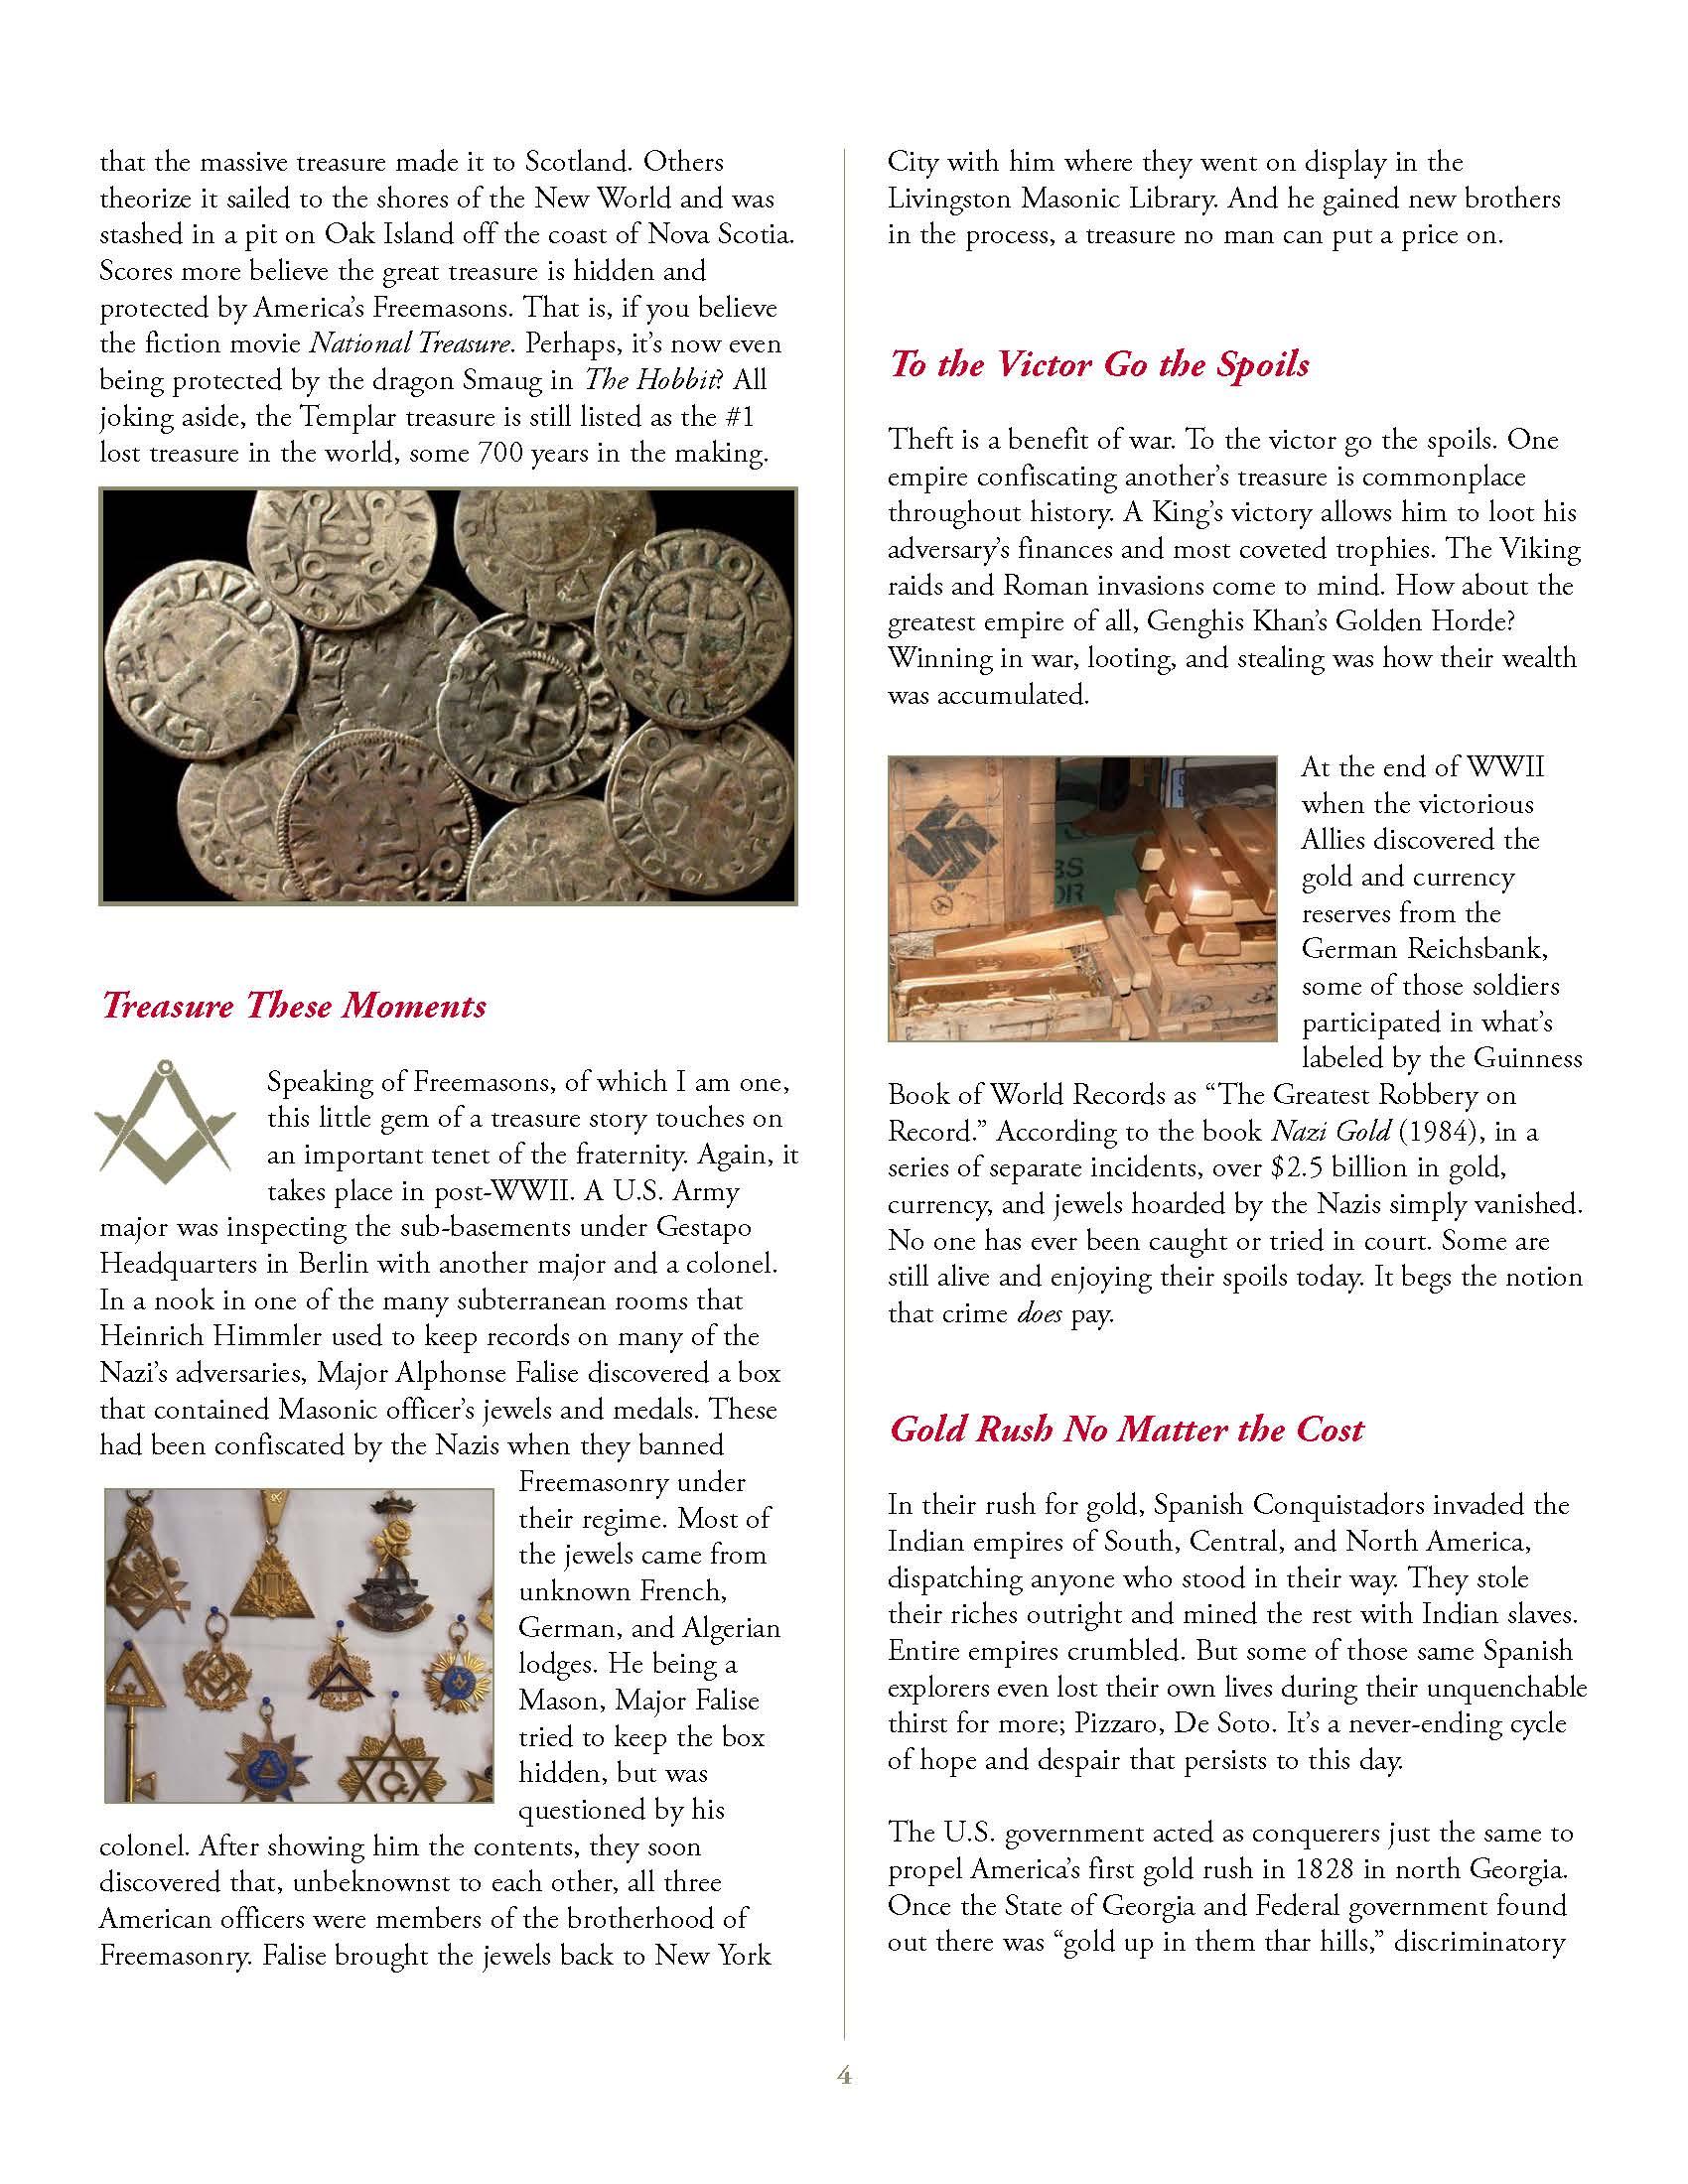 Finding-Treasure-article_Page_4.jpg